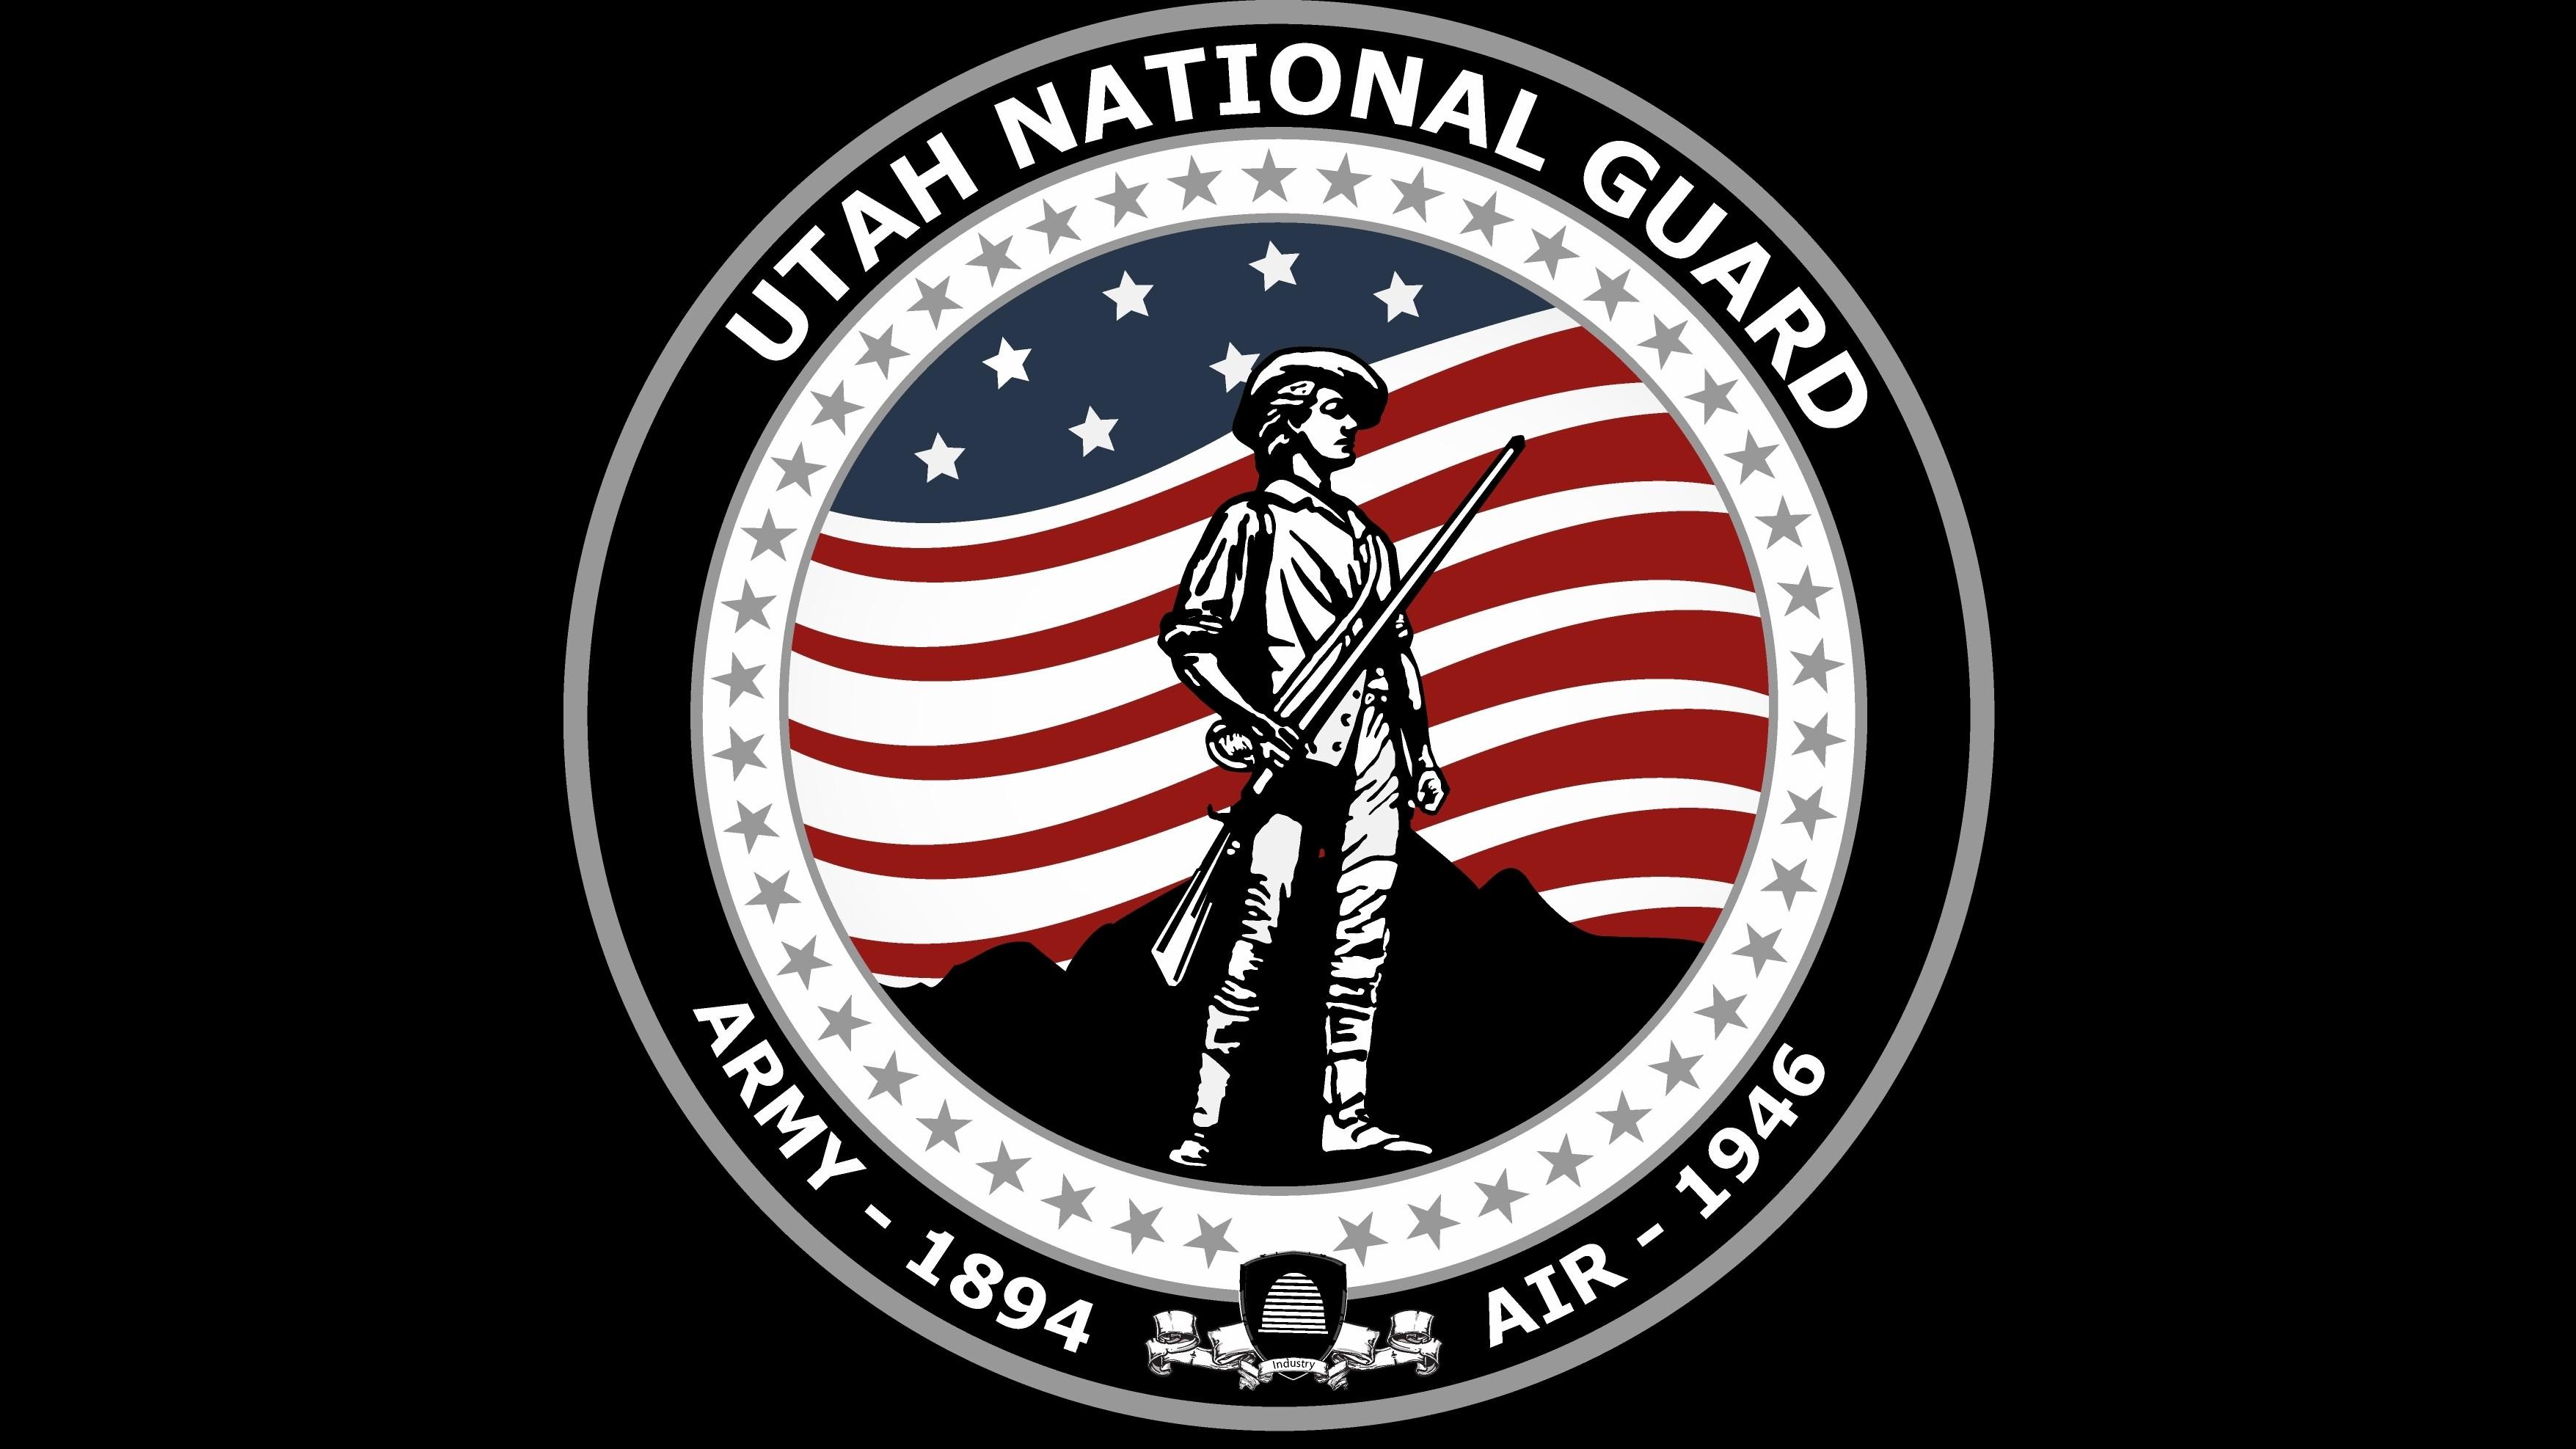 National Guard Computer Wallpapers, Desktop Backgrounds   .